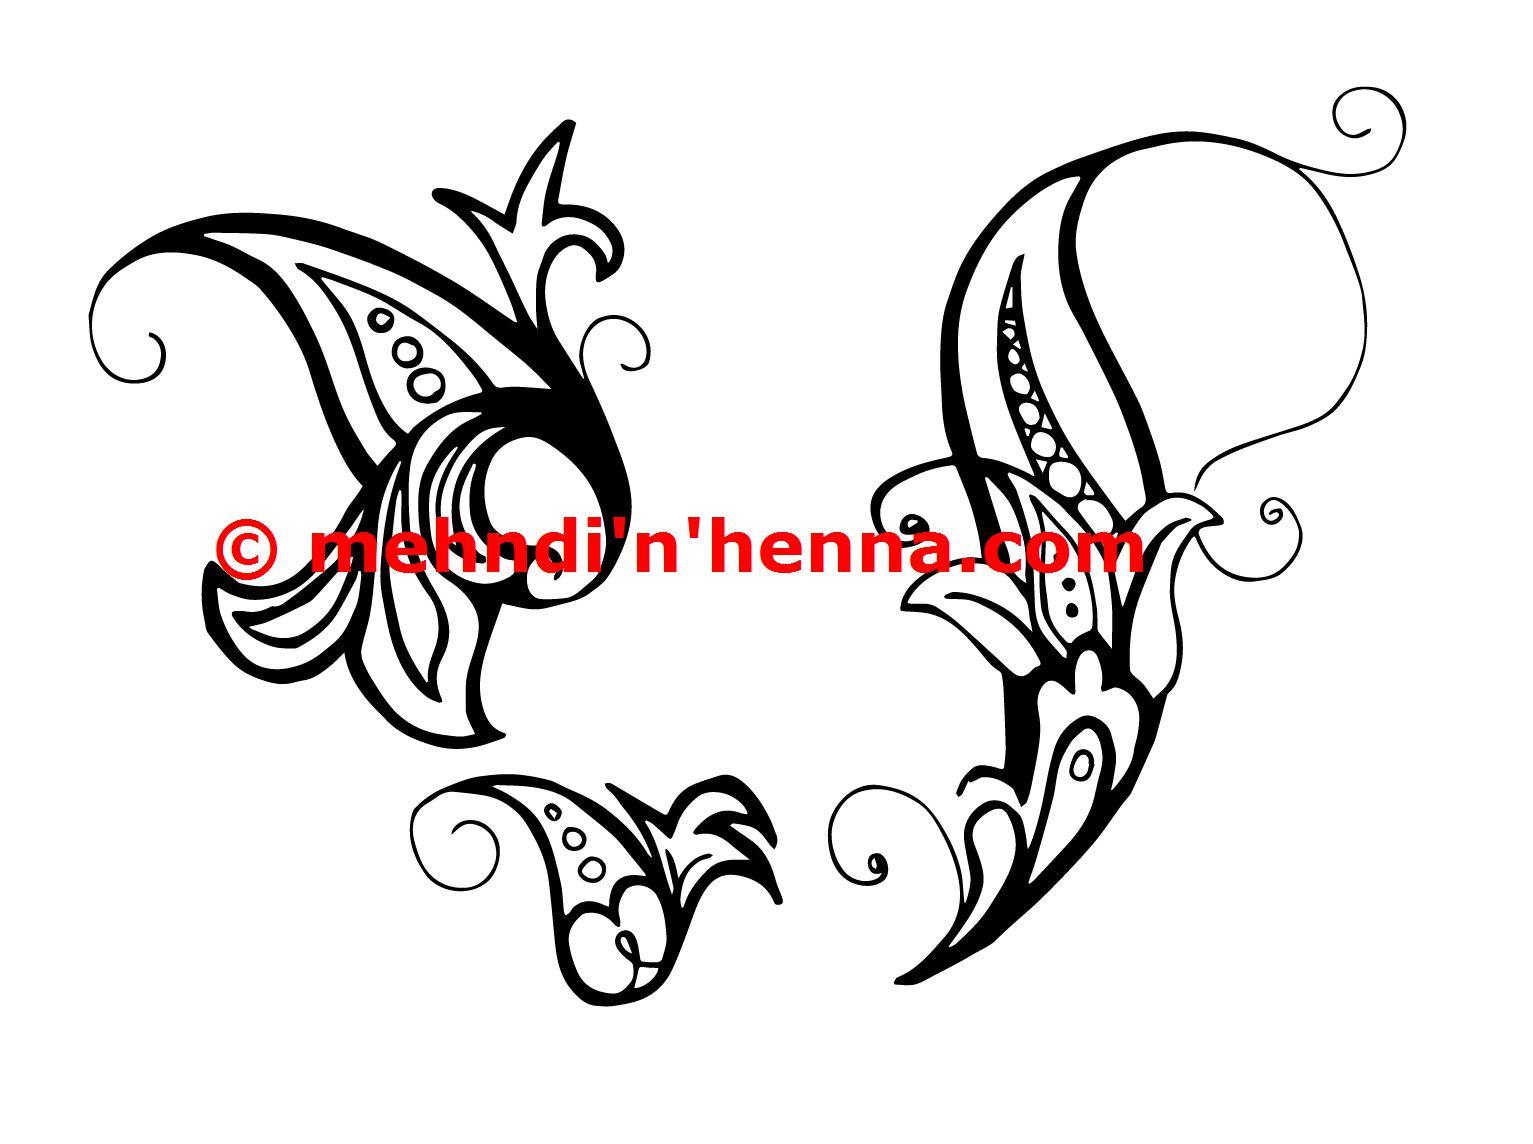 Paisley Henna Tattoos